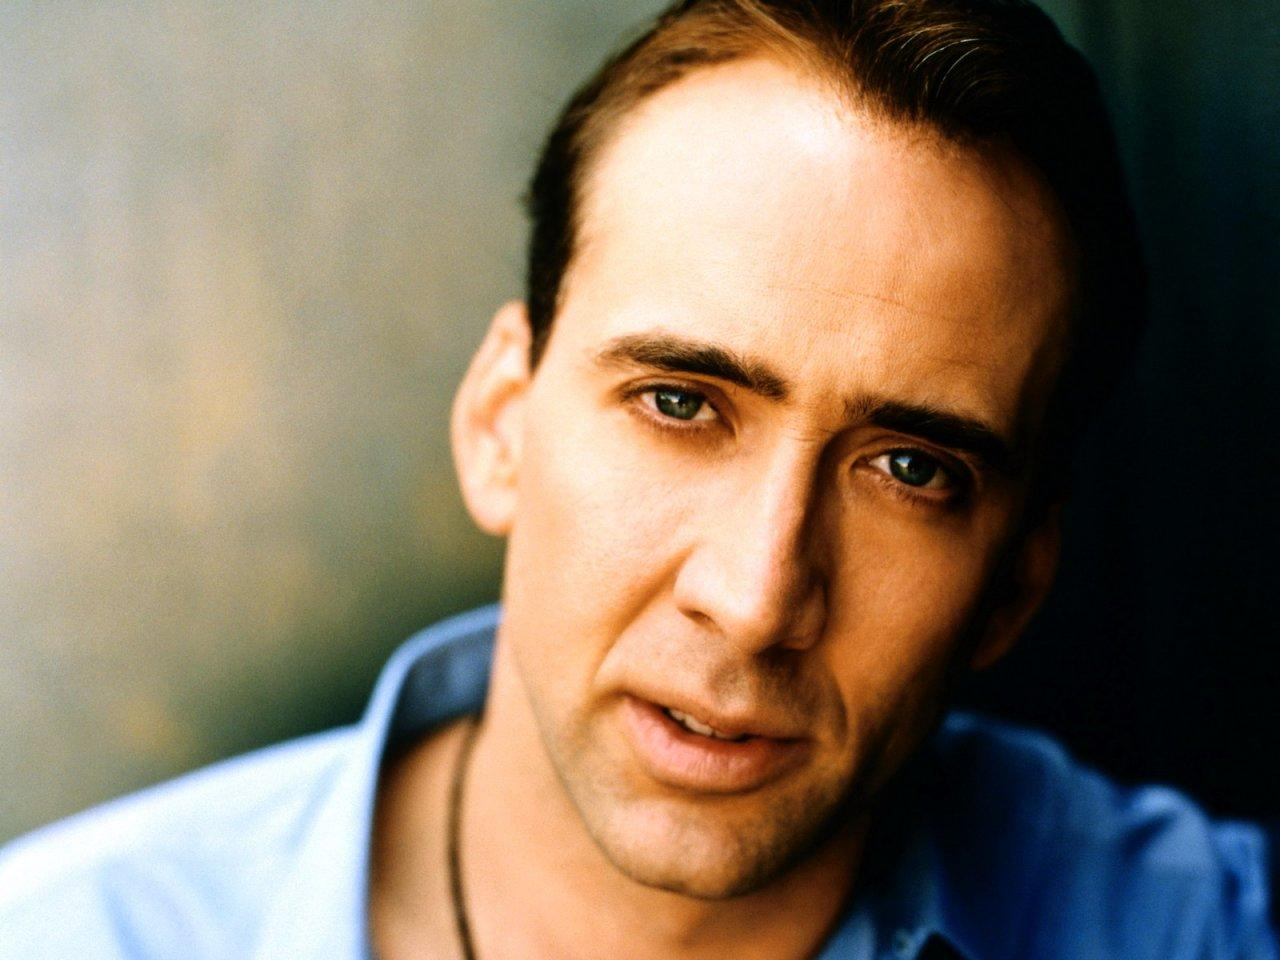 33] Nicolas Cage Wallpapers on WallpaperSafari 1280x960